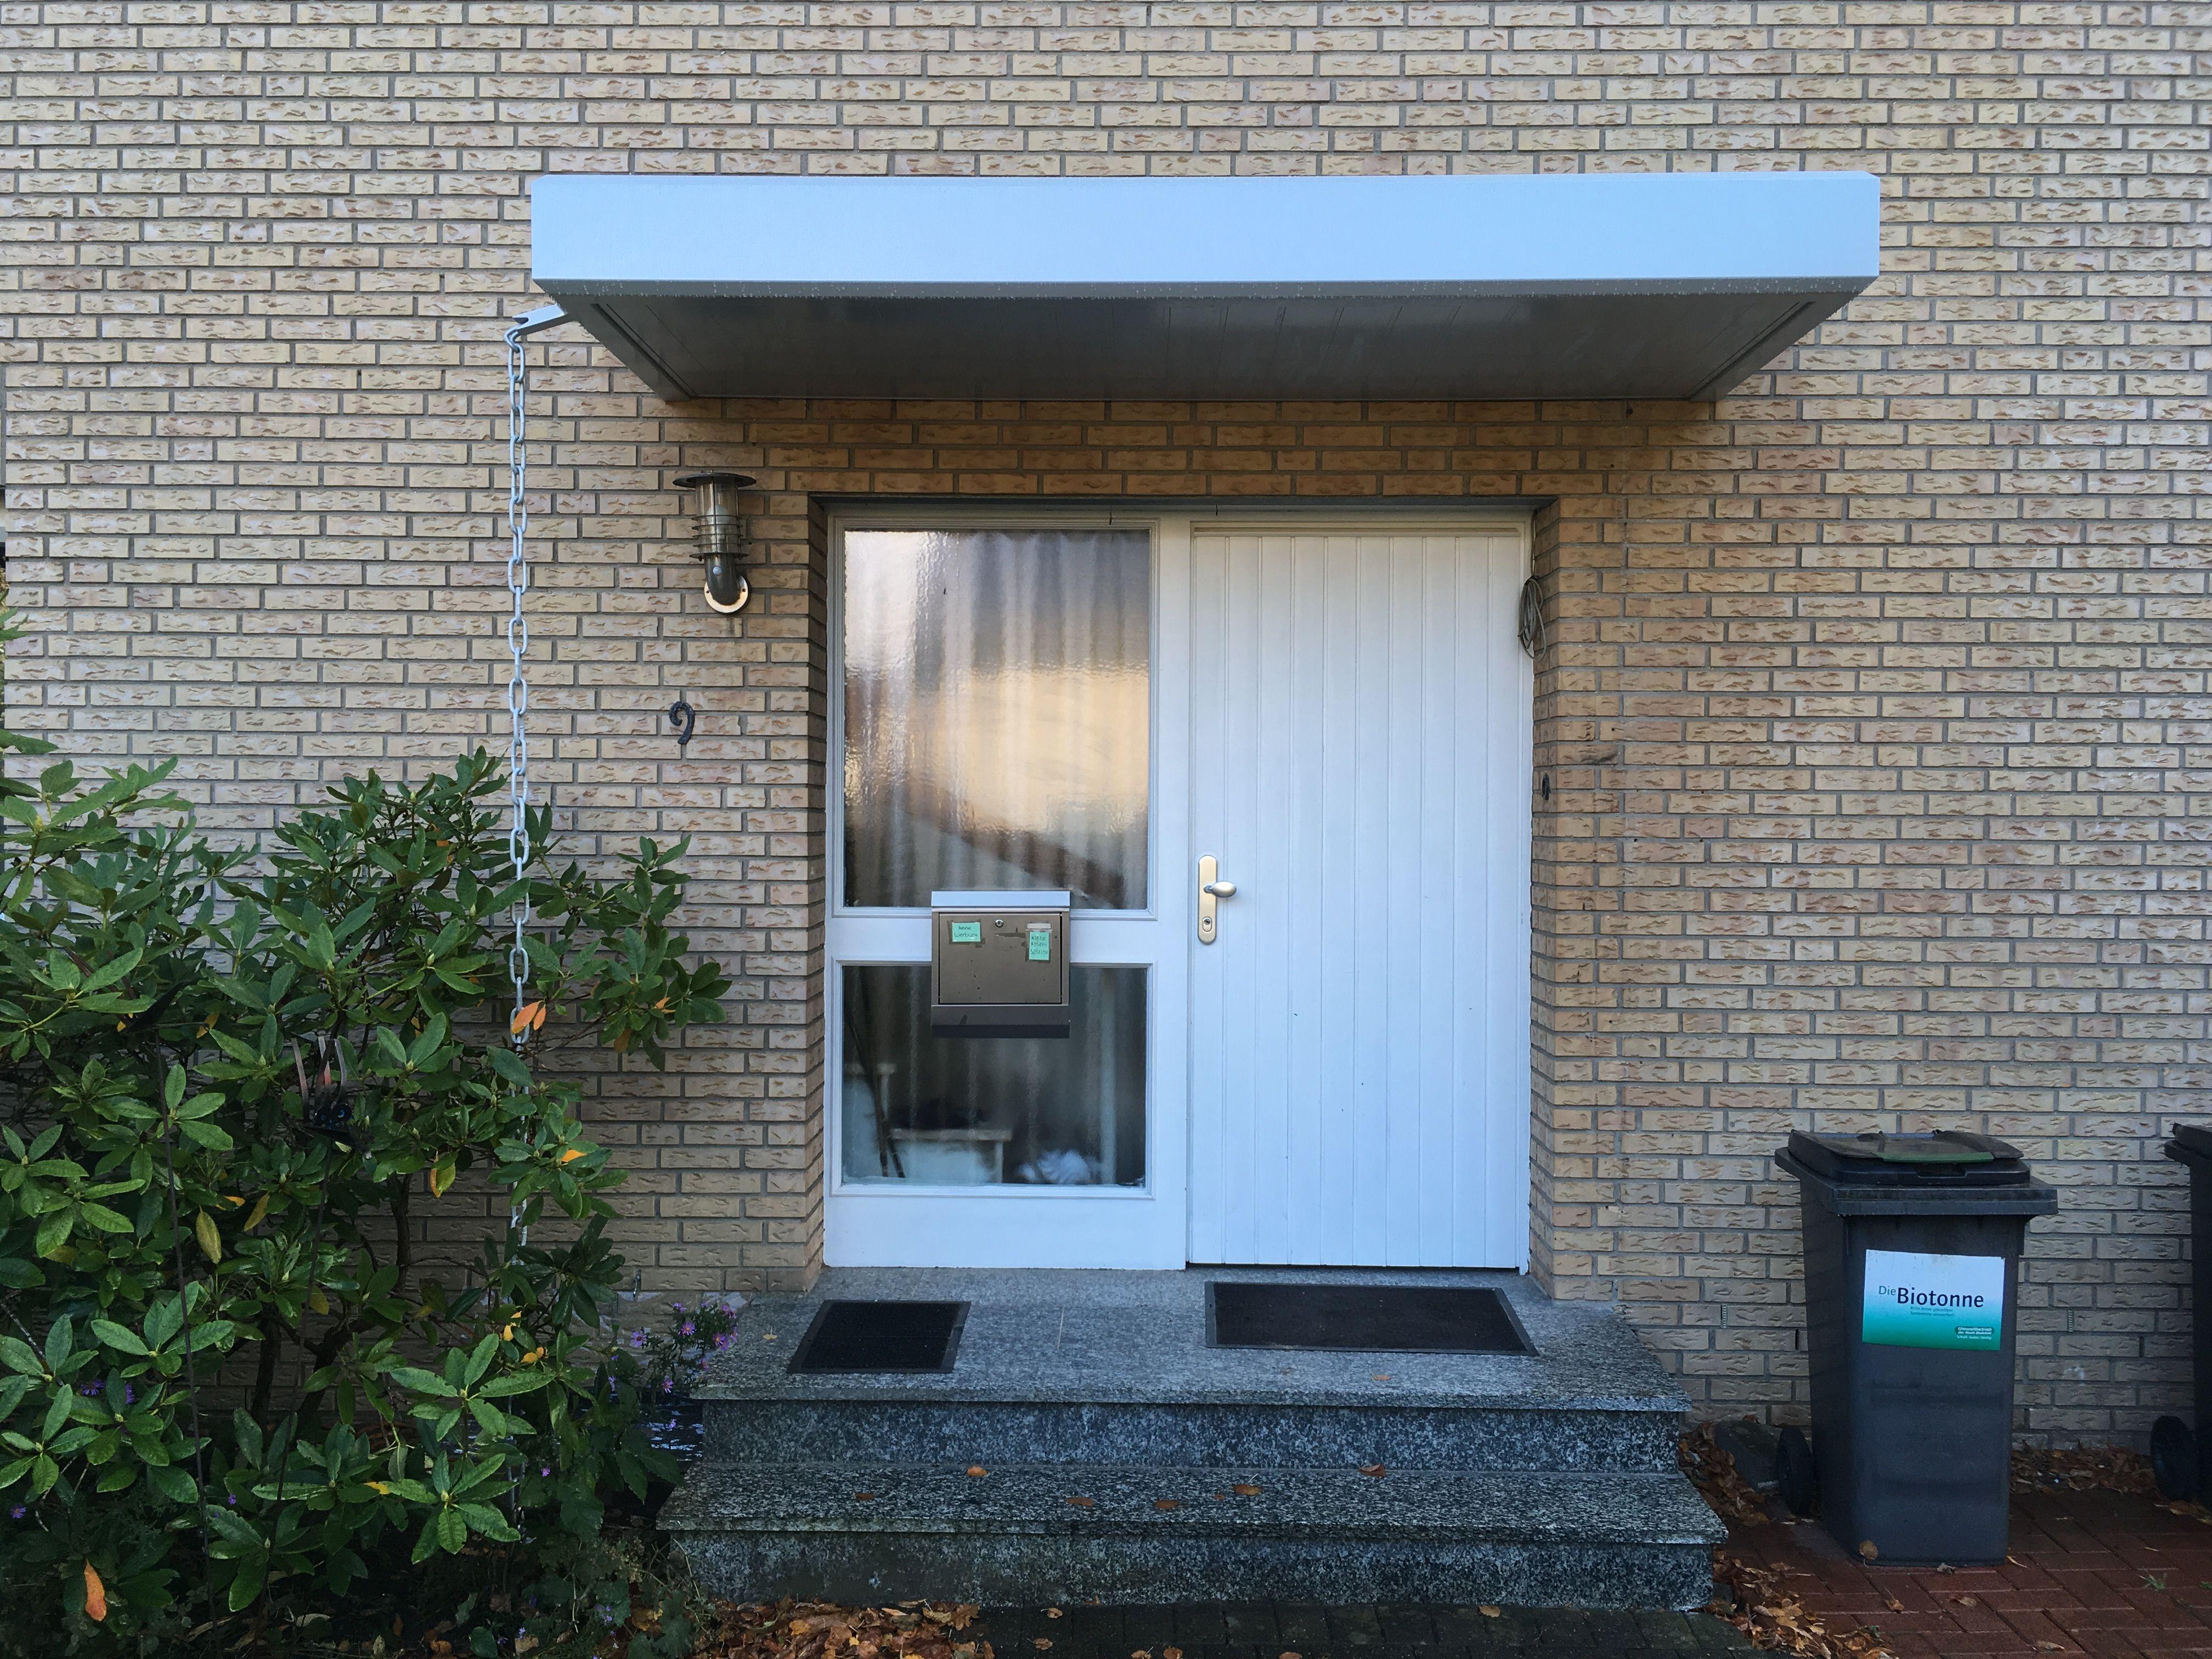 Betonvordach vs. Aluminium Hausürvordach. Lass einfach das